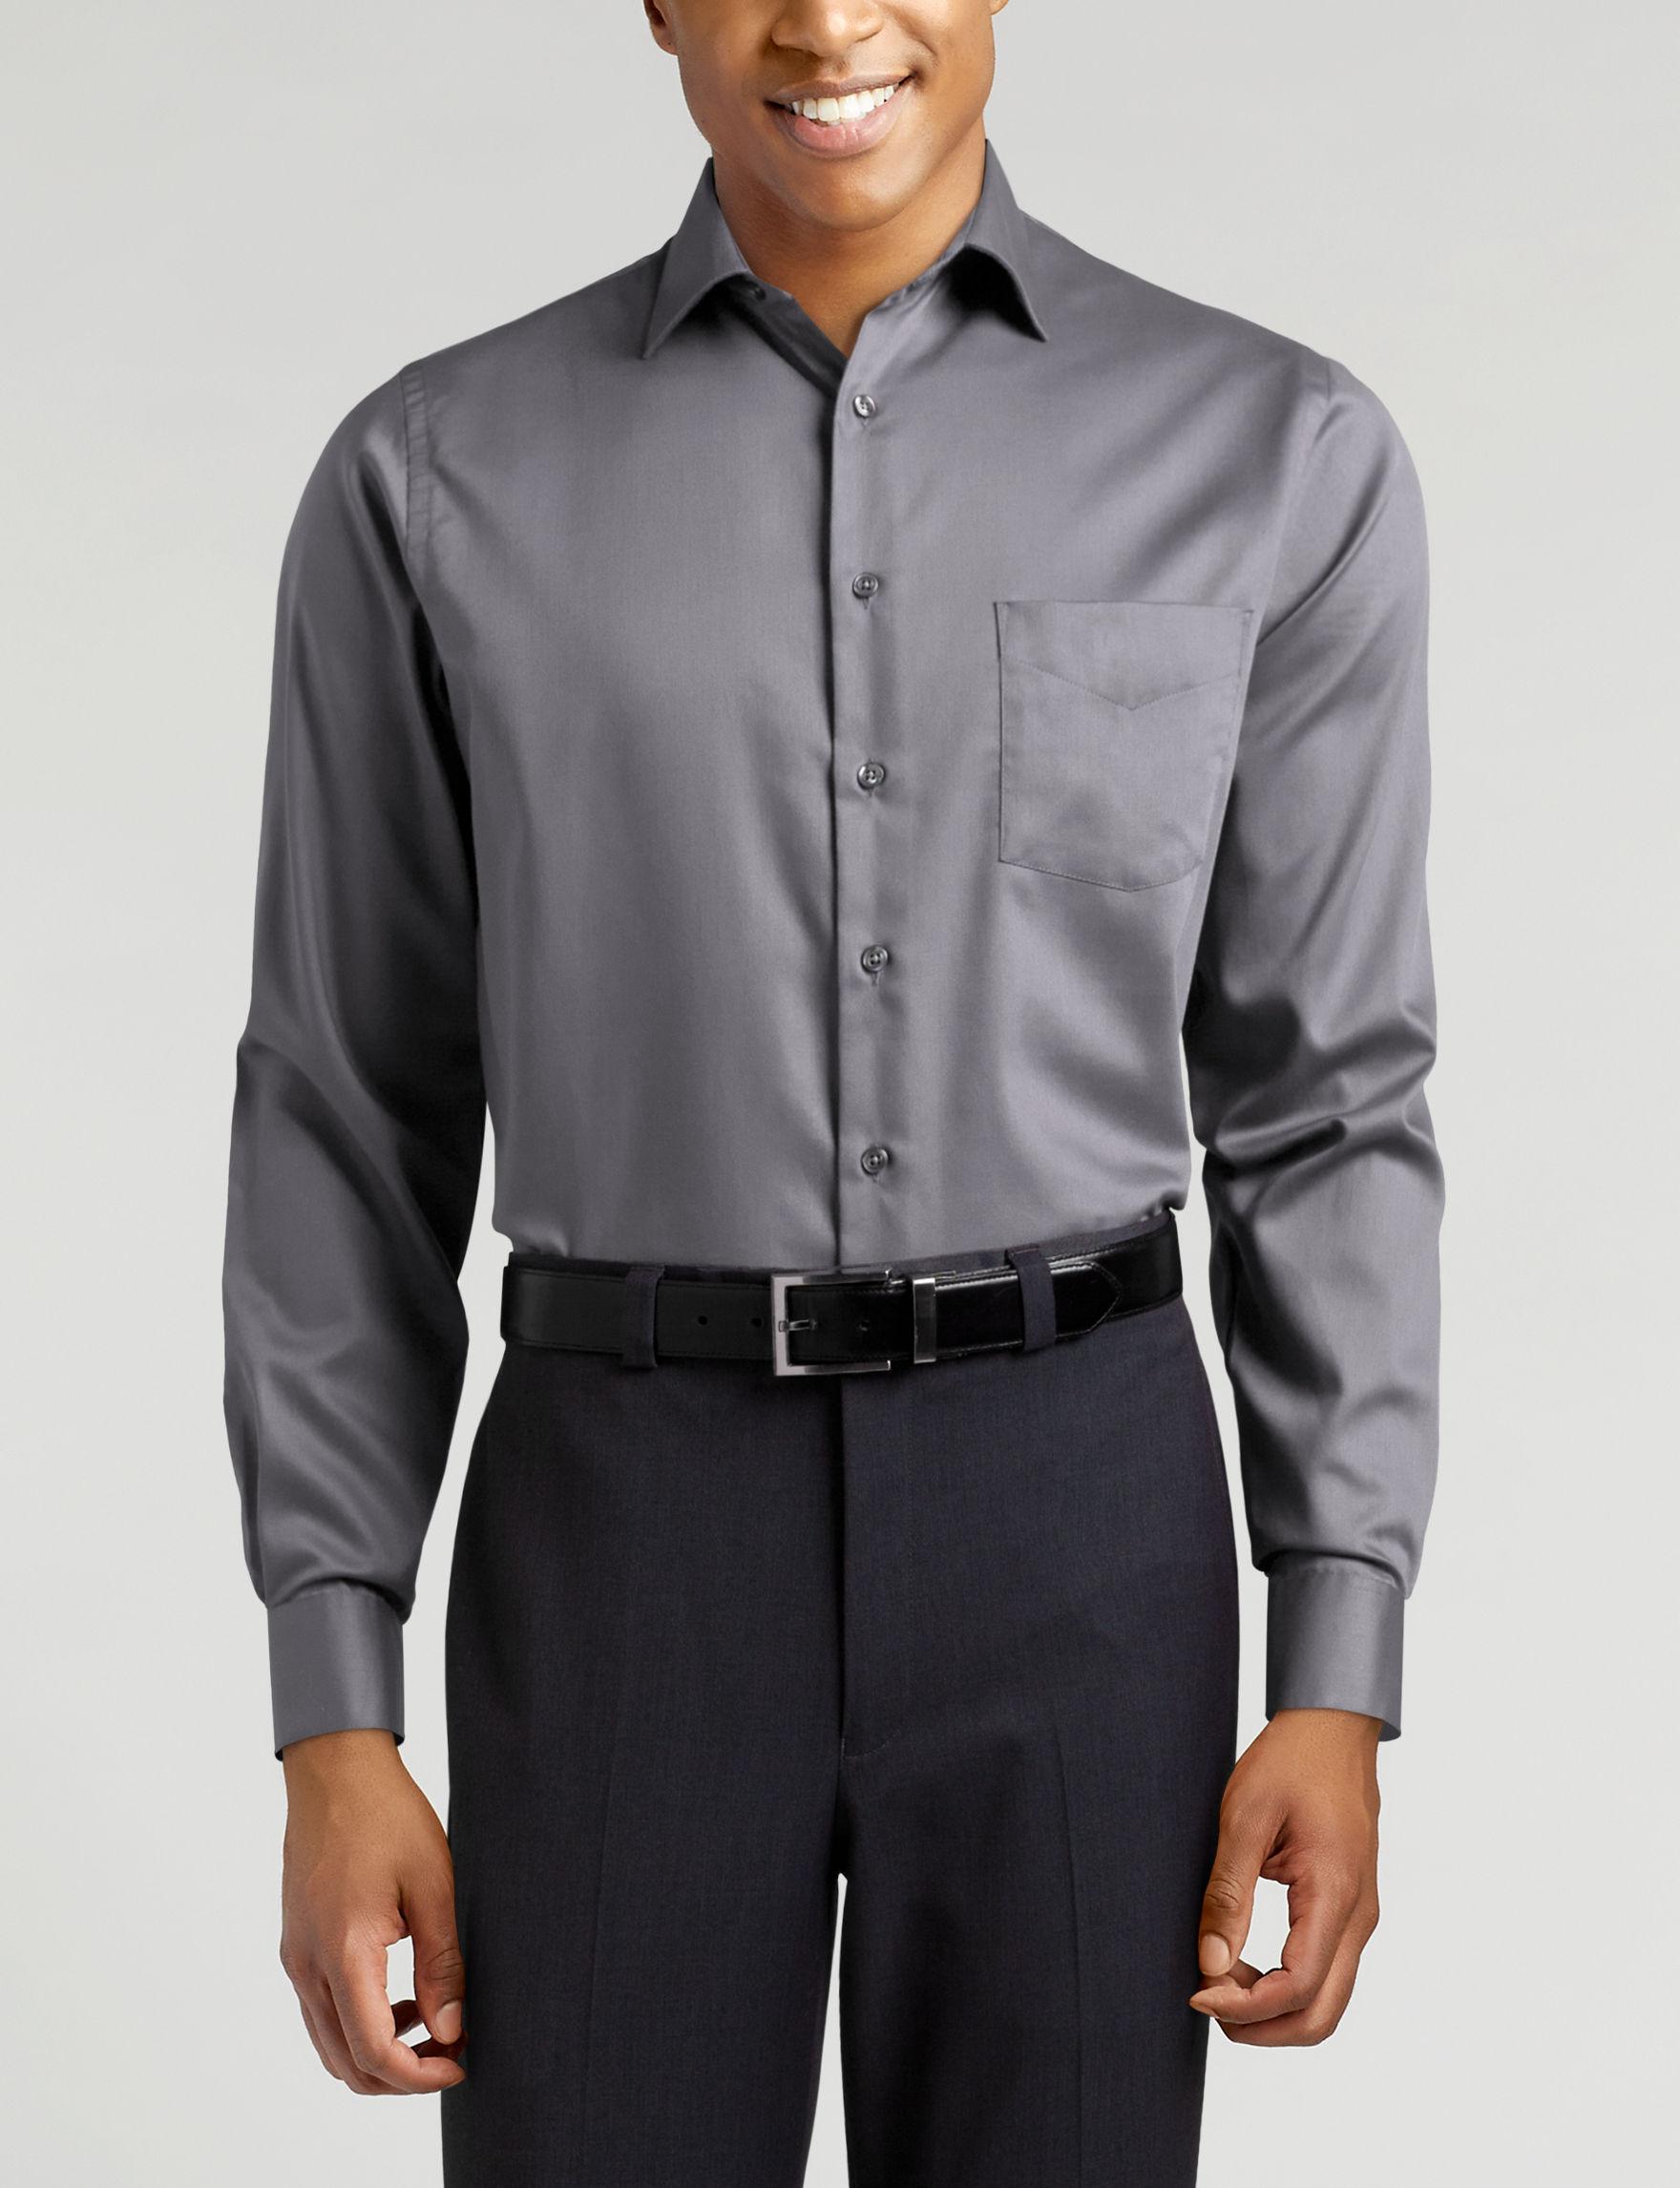 Van Heusen Grey Dress Shirts